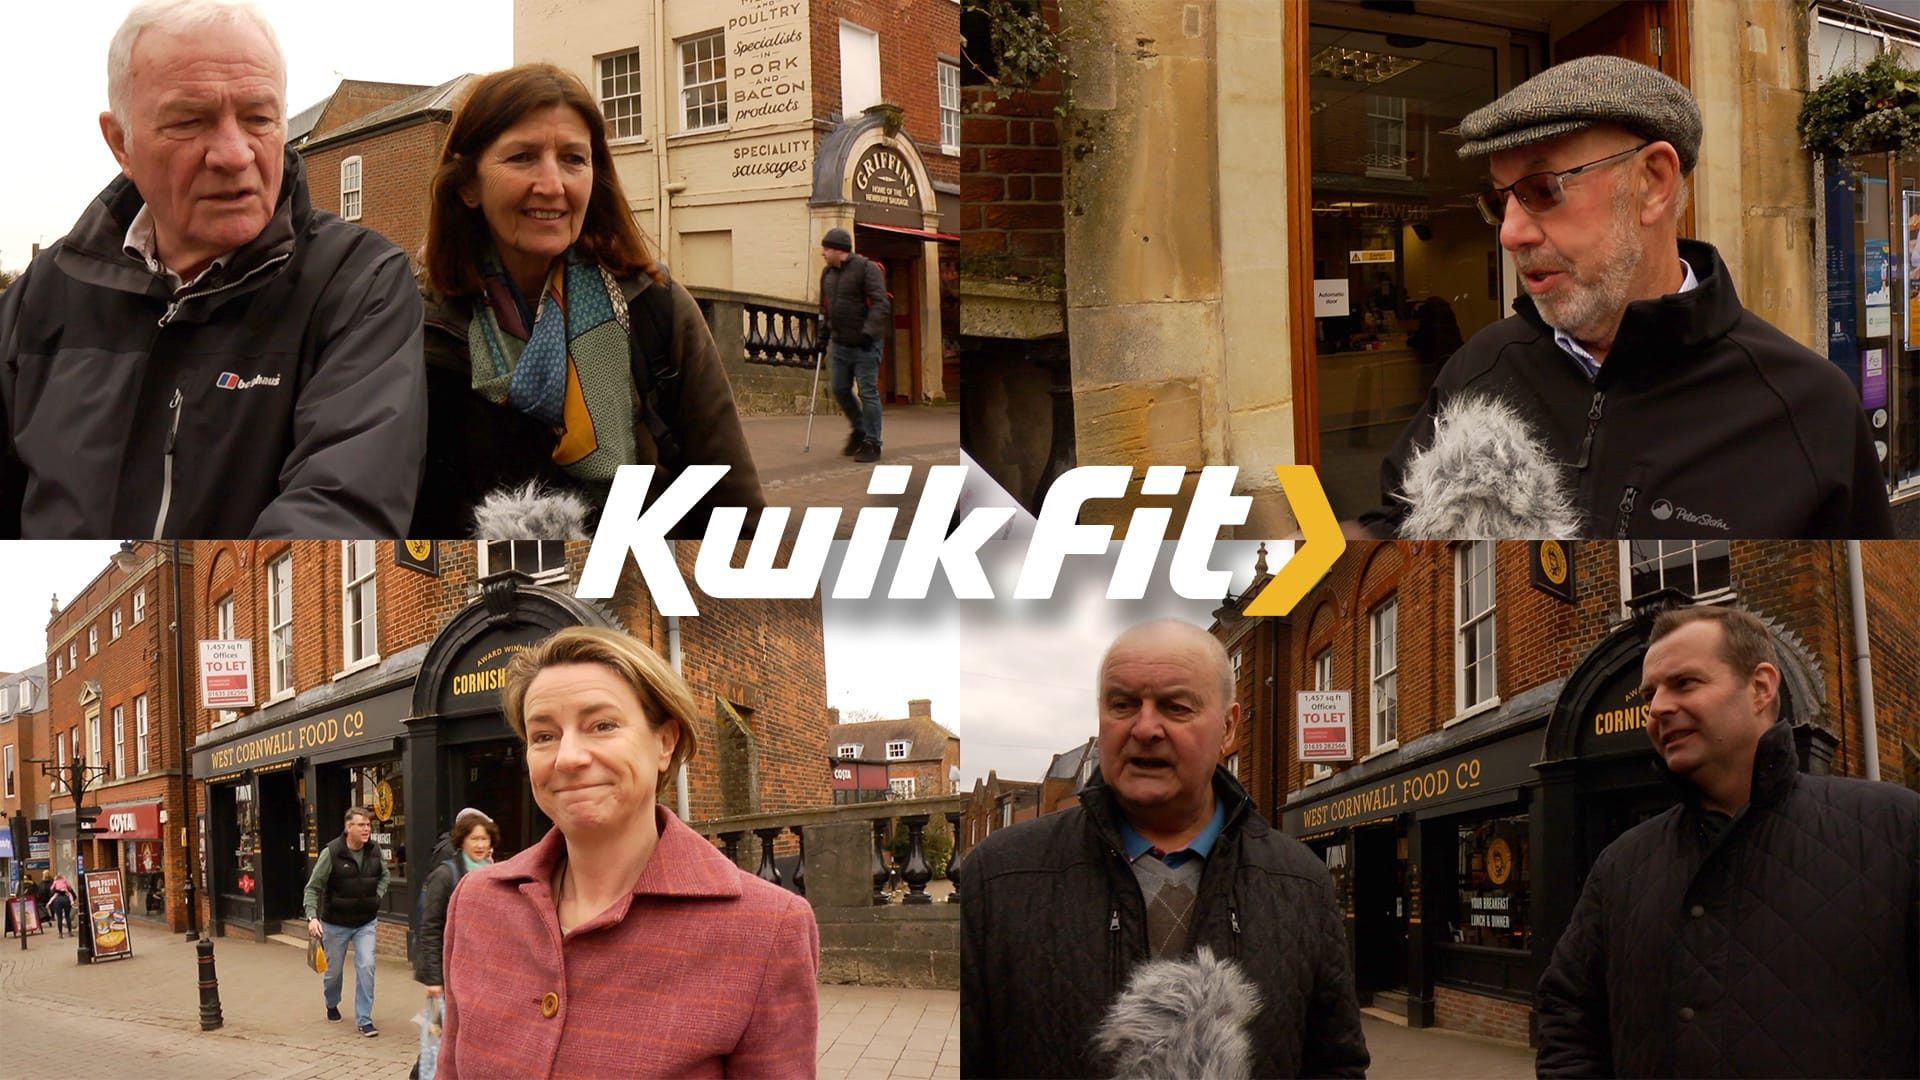 Filming voxpops on the street for Kwikfit